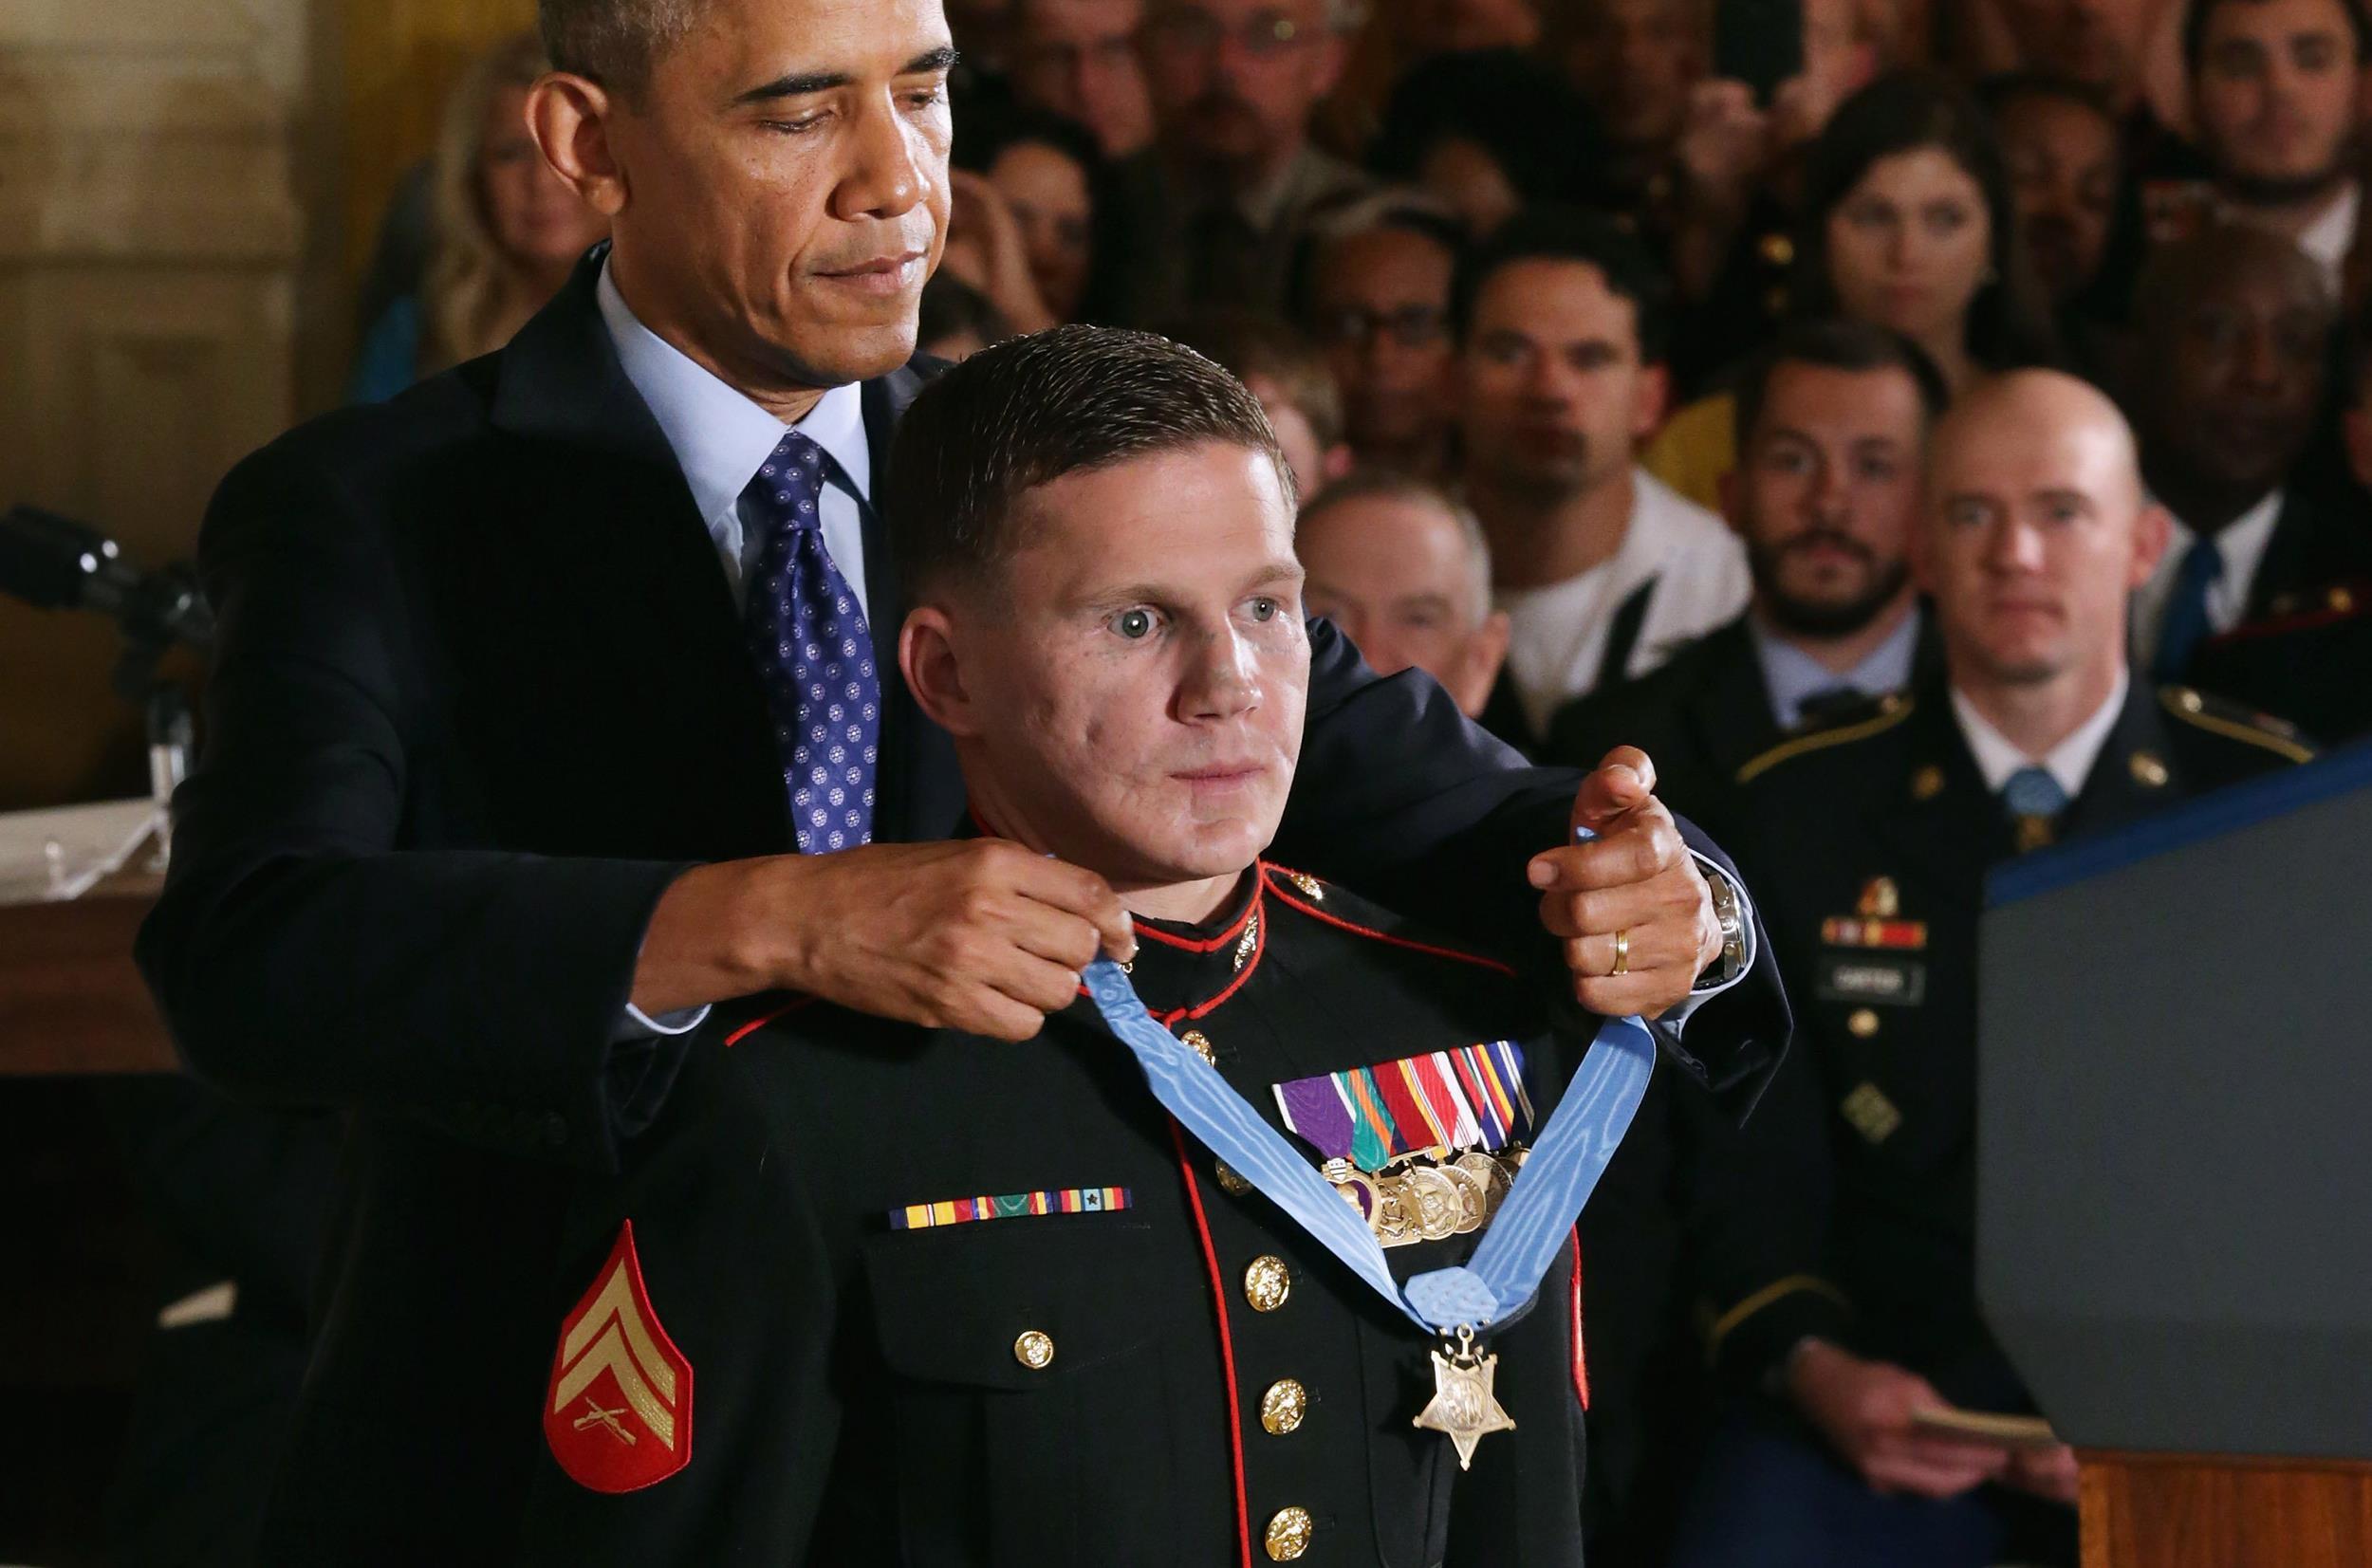 Image: President Obama Awards Medal Of Honor To Marine William Kyle Carpenter